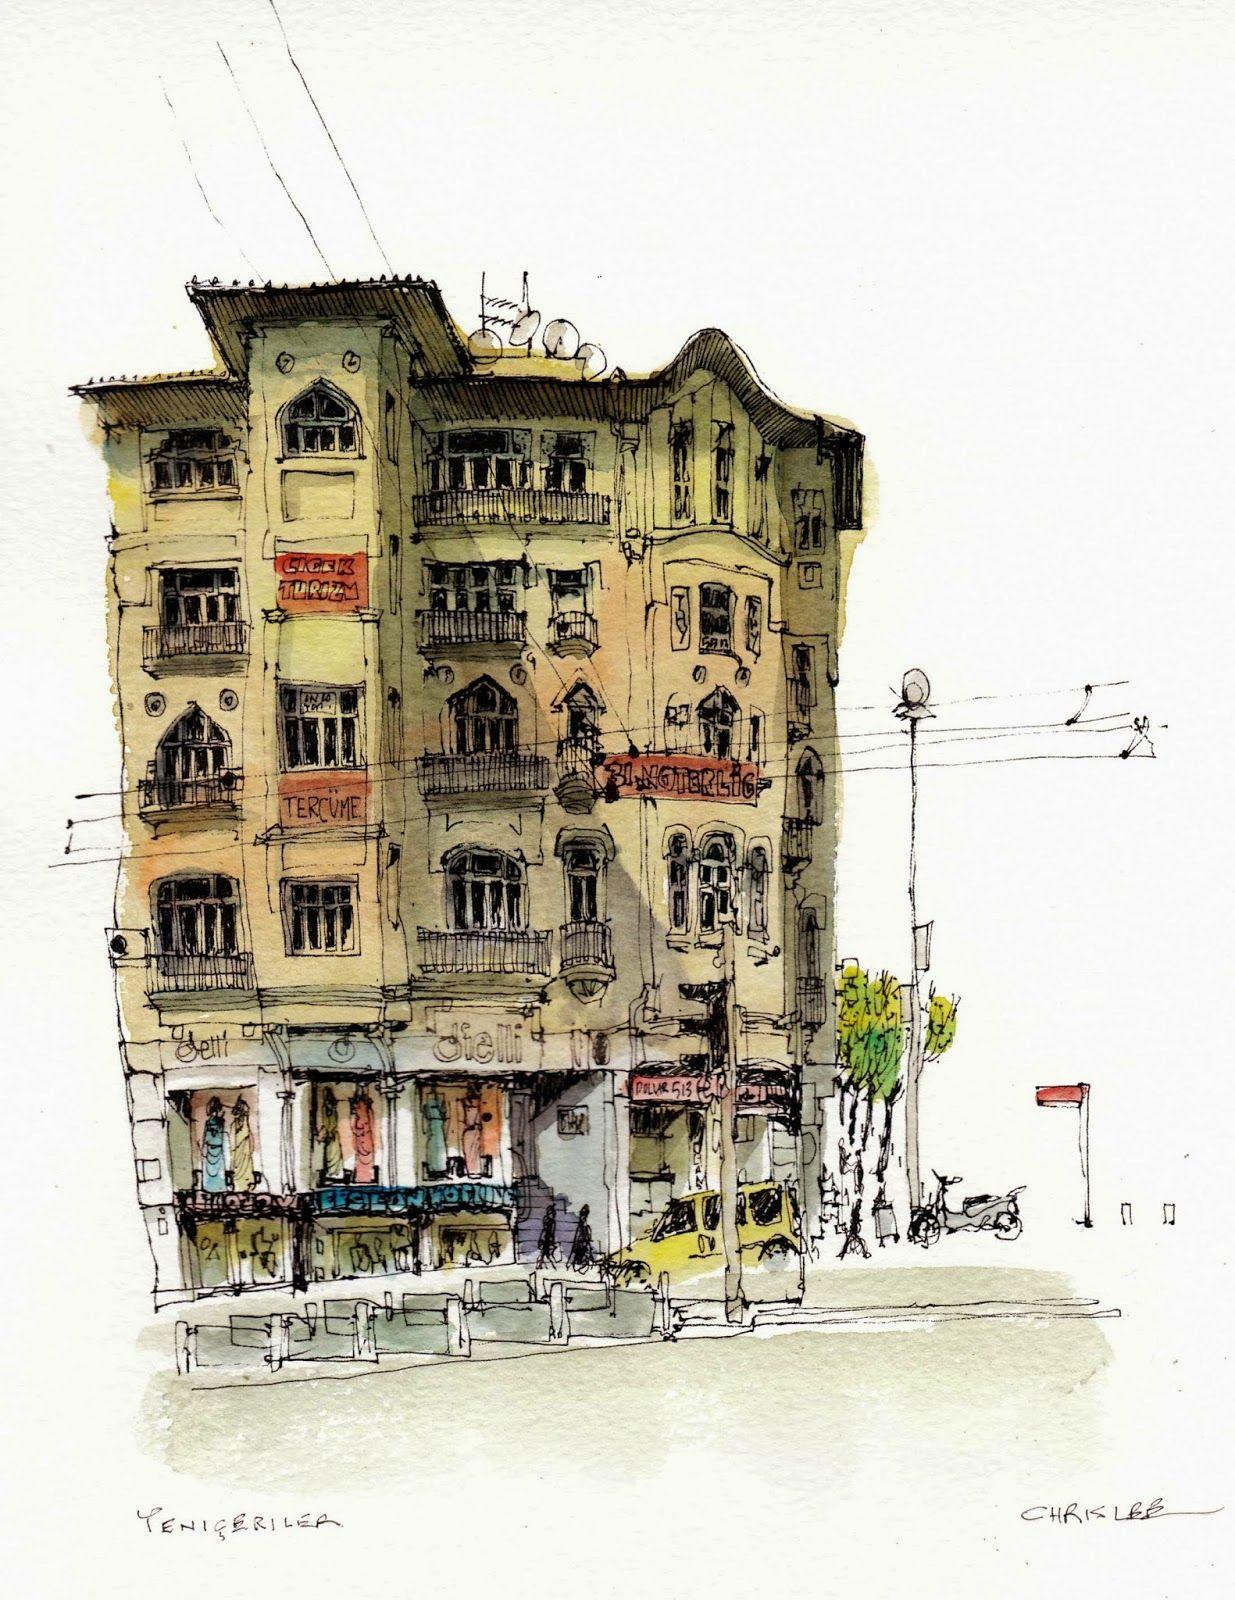 Chris lee sketching urban sketching pinterest for Chris lee architect